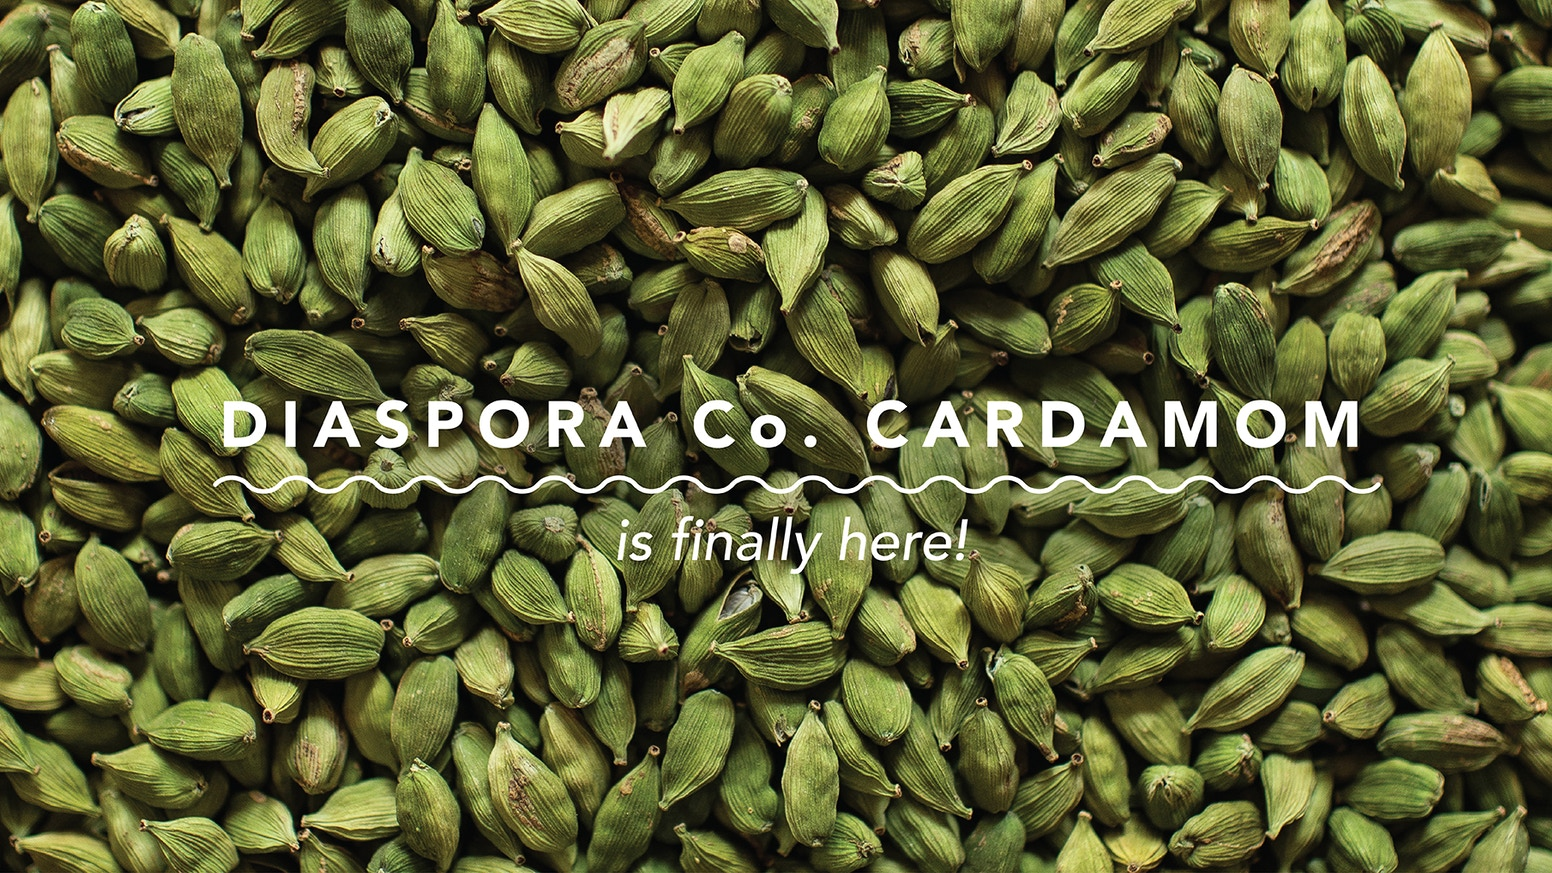 Potent, fruity, with a heady aroma— Diaspora Co. Cardamom is finally here!